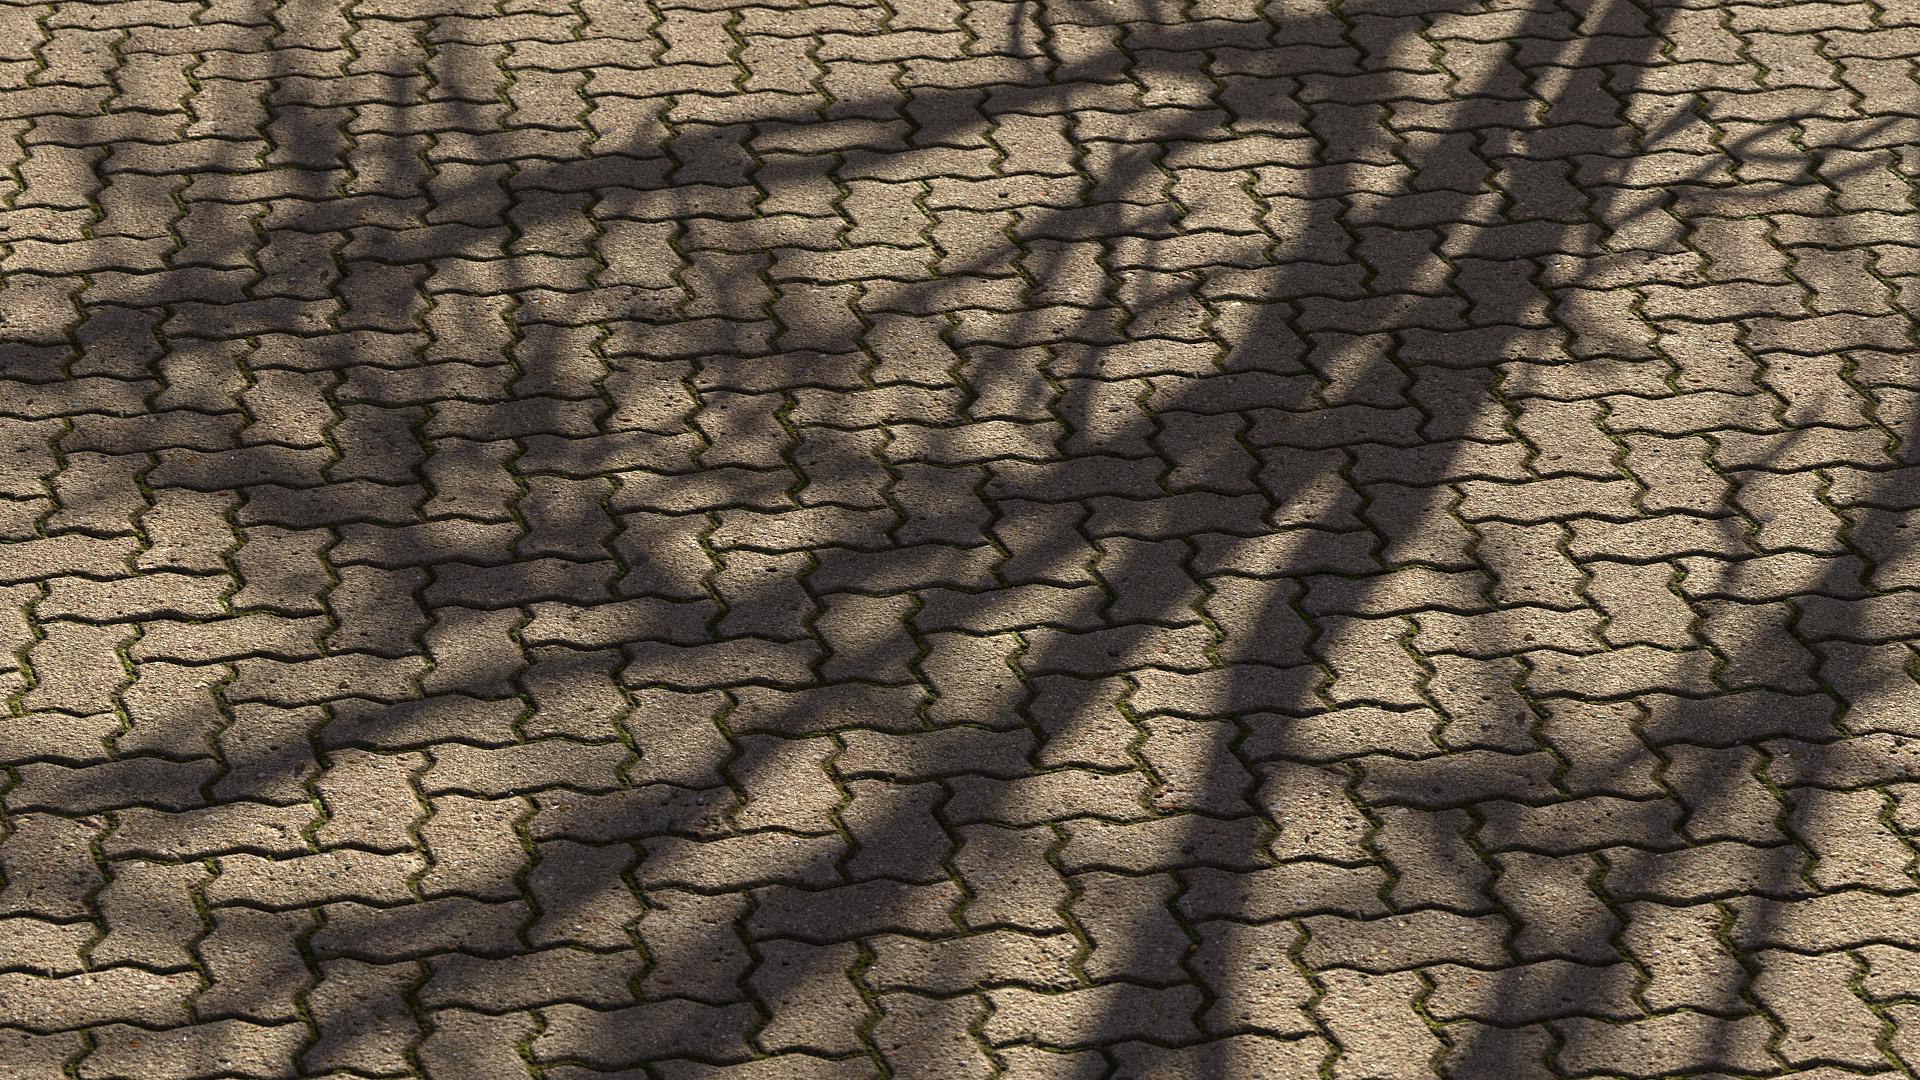 Pavement Herringbone | 3D Scanned Textures